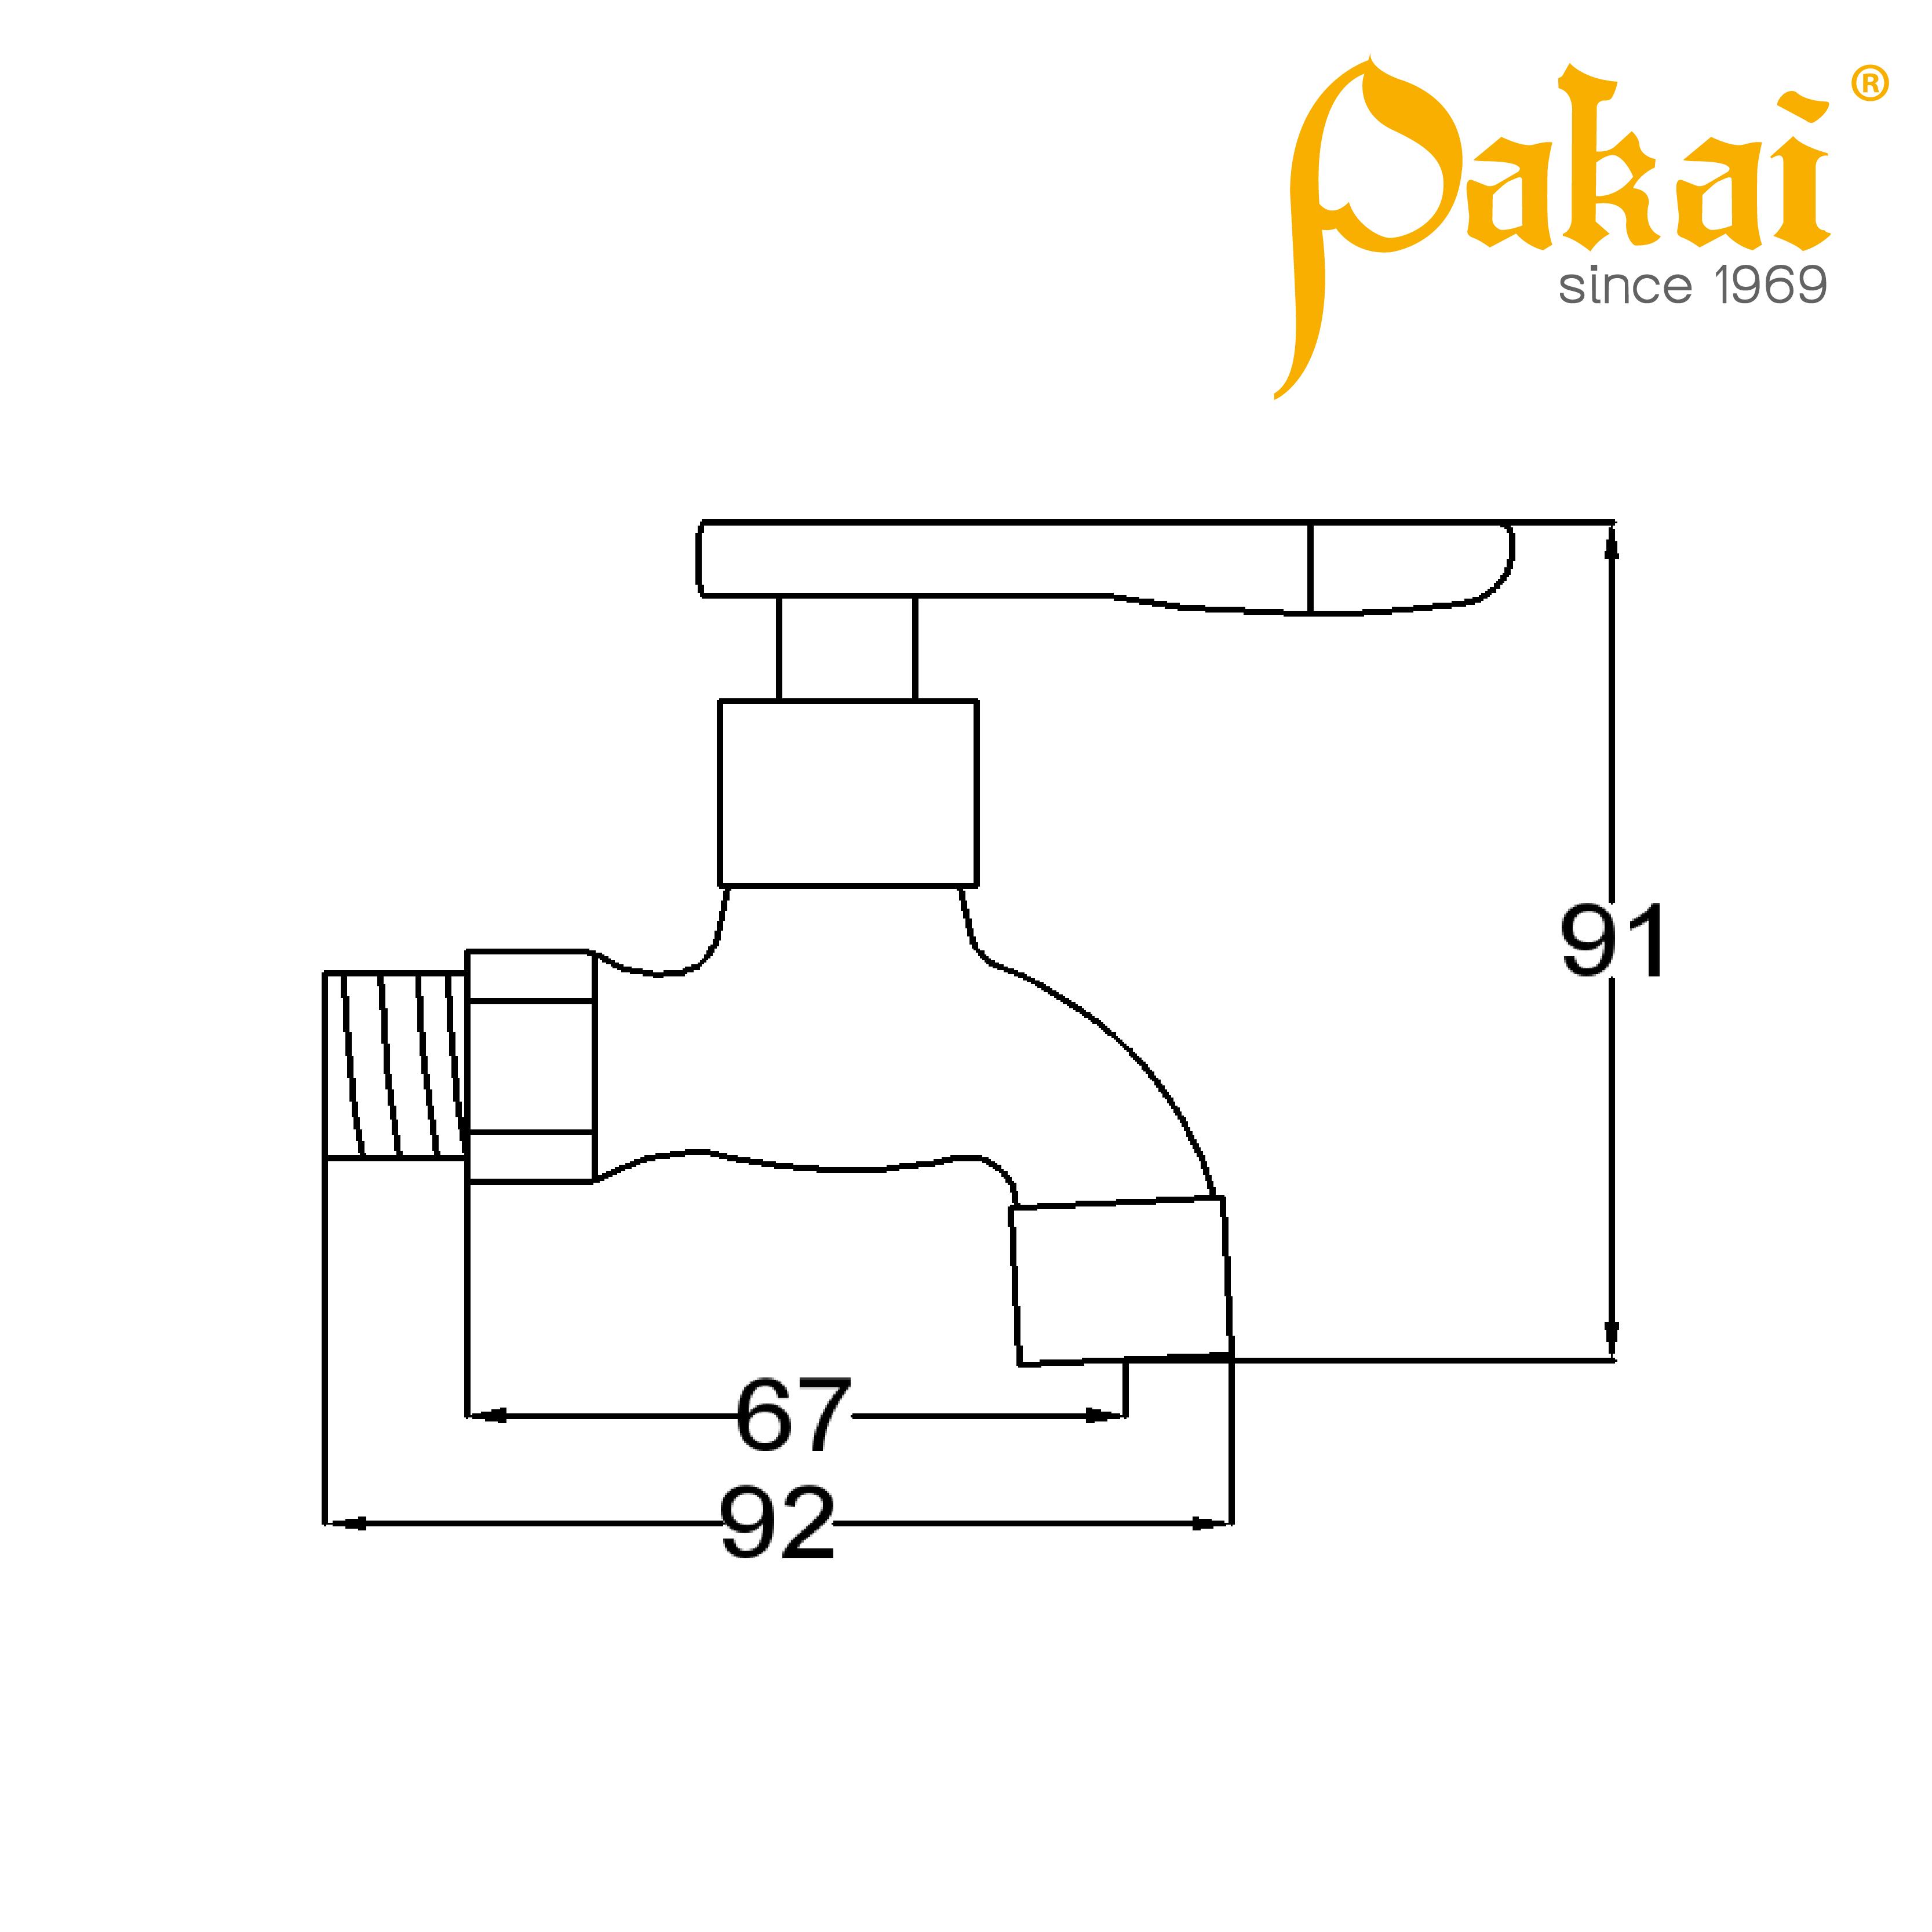 Pakai Wall Bib Tap - Short Curve Series CV06S